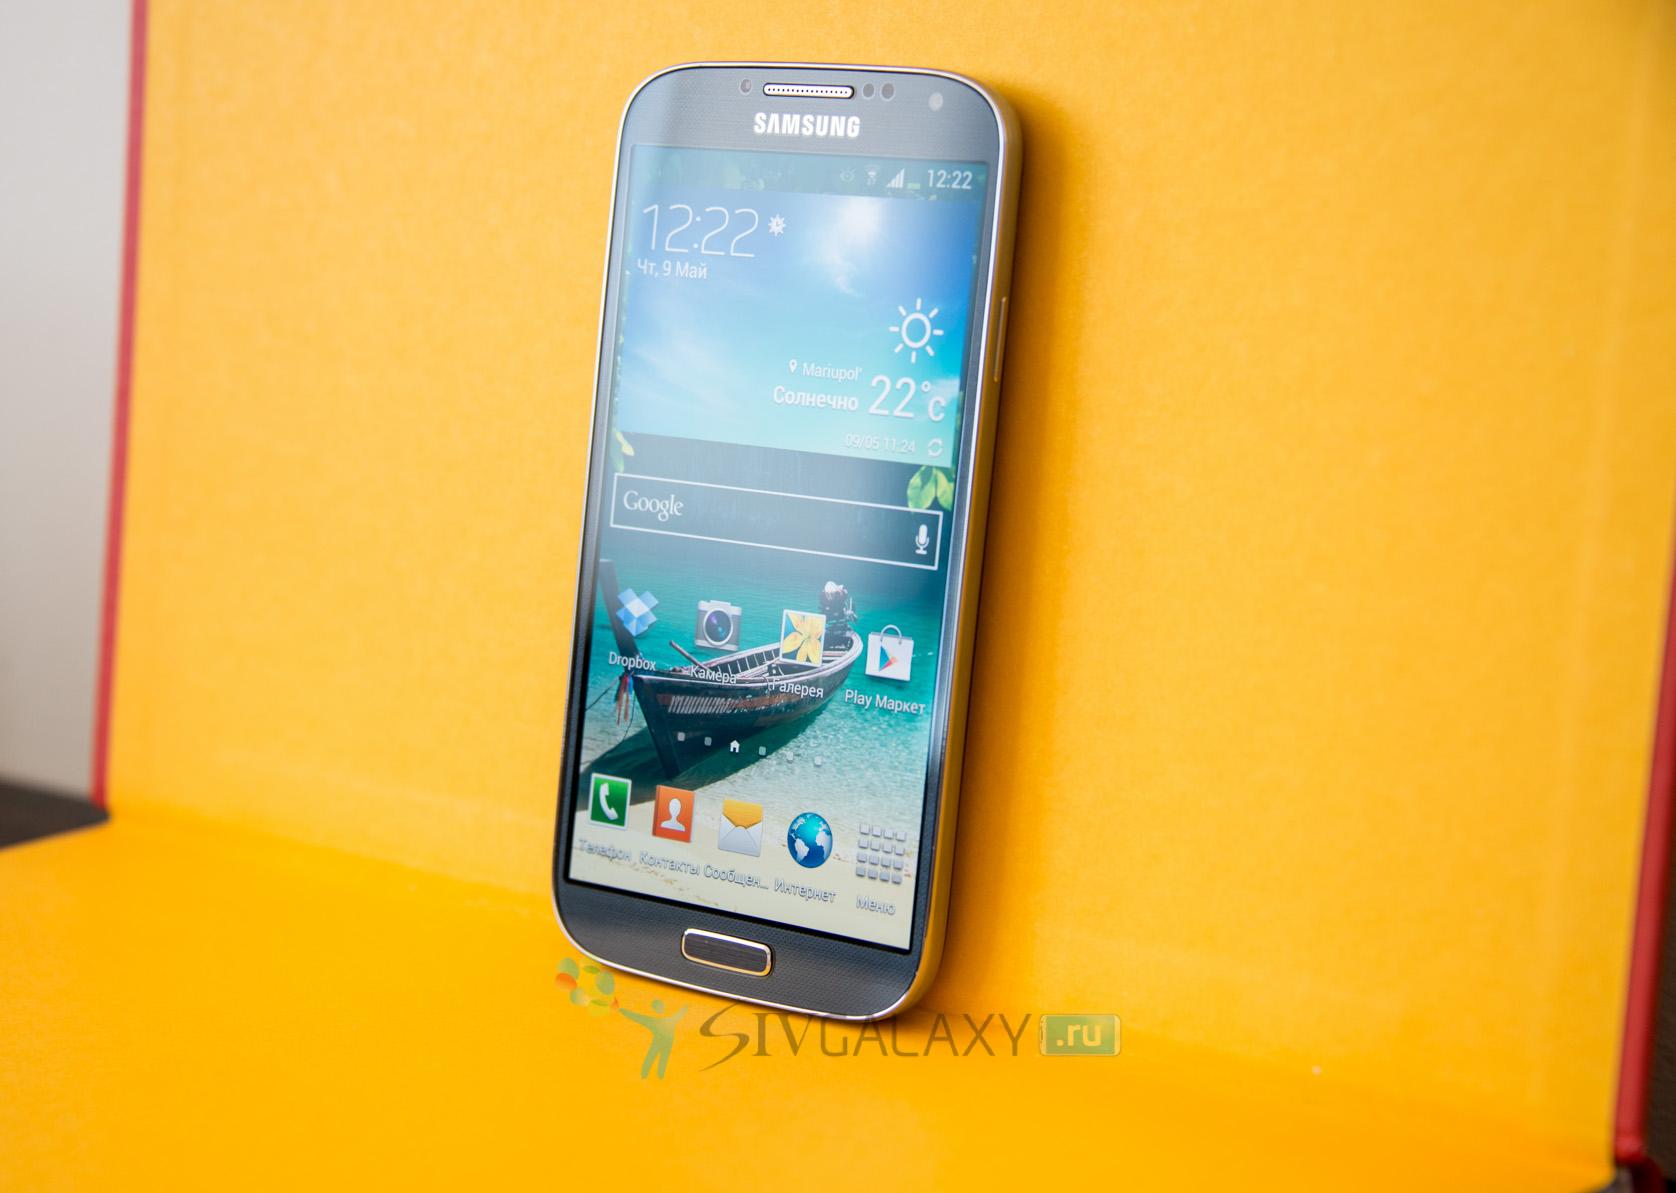 Экран в Samsung Galaxy S4